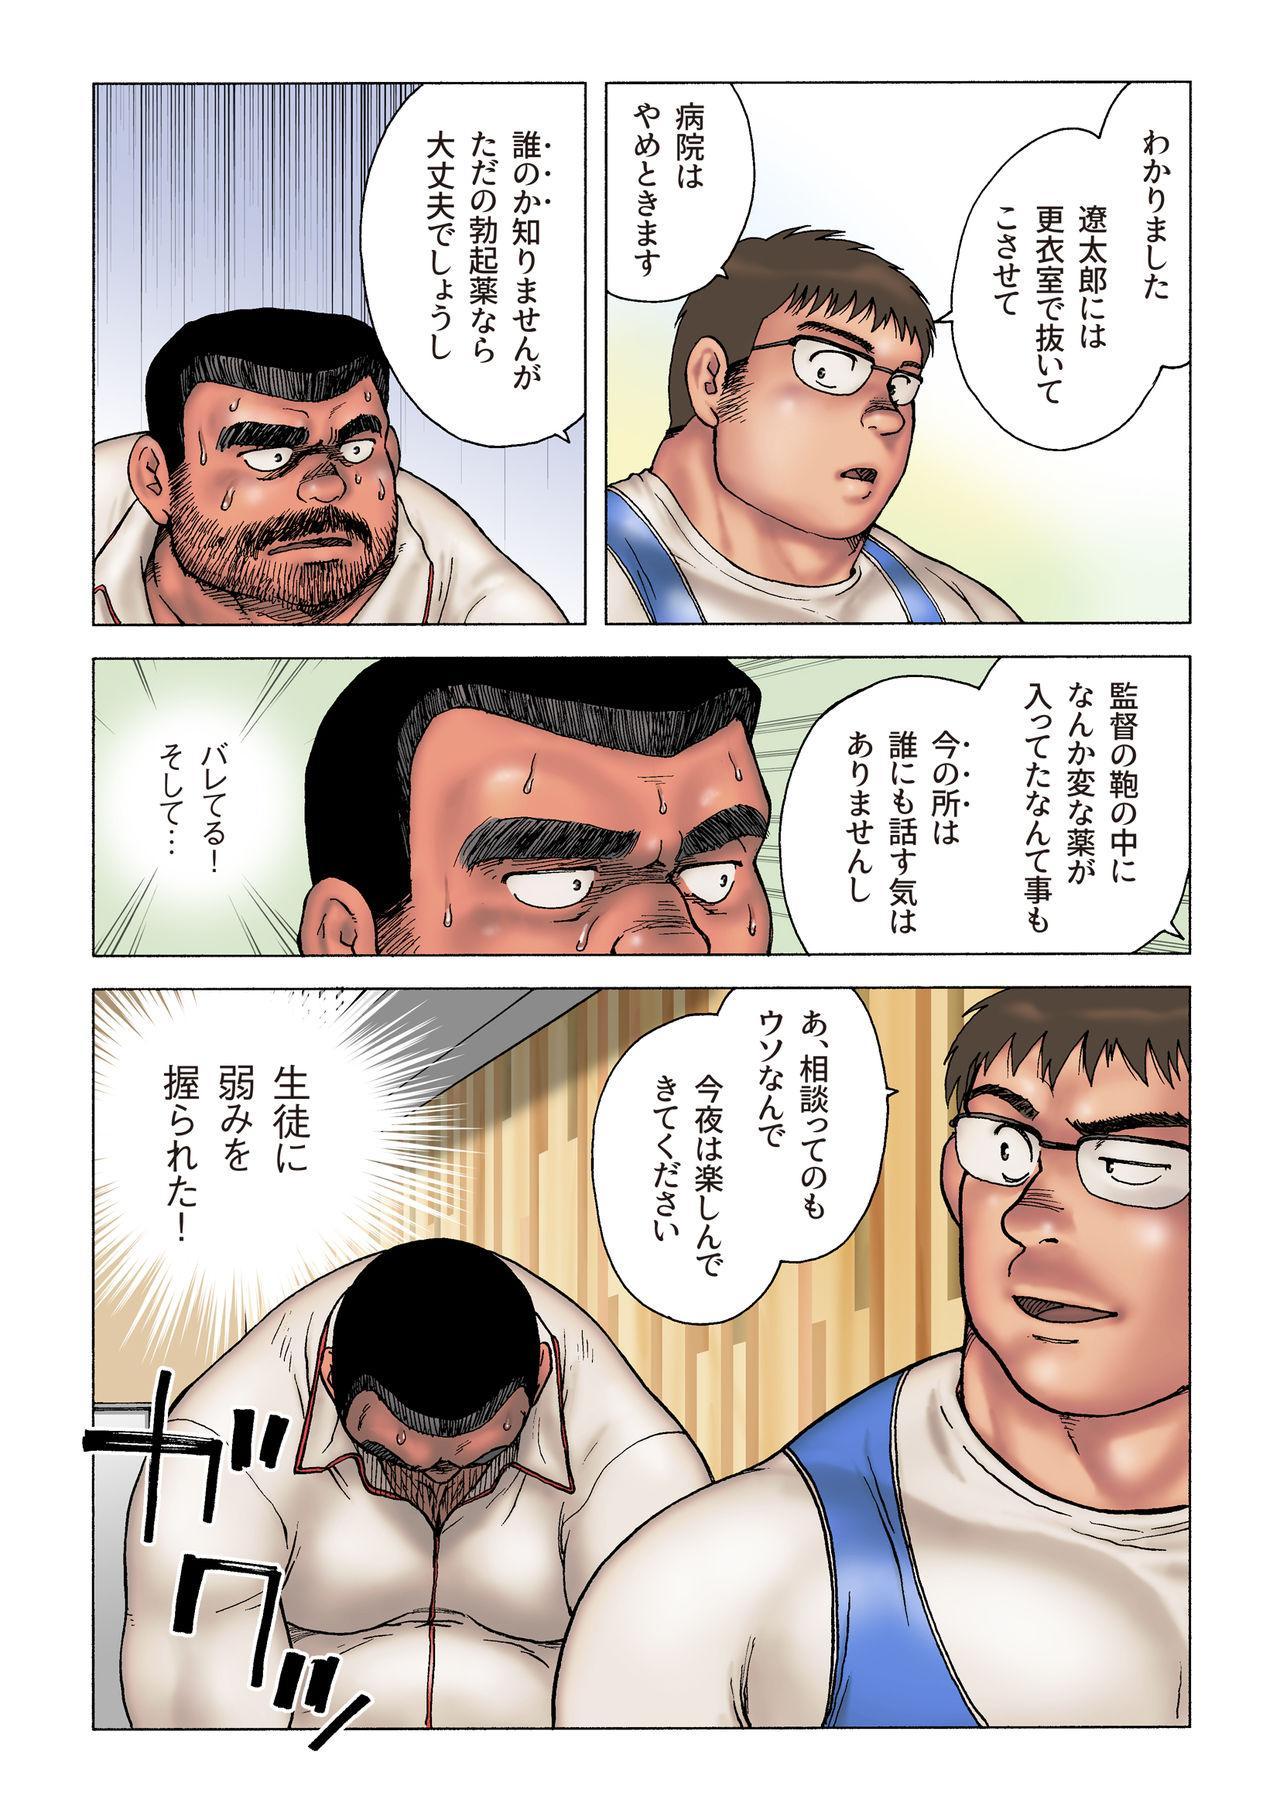 Danshi Koukousei Weightlifter Shiai-chuu, Osae kirenai Wakai Takeri 17